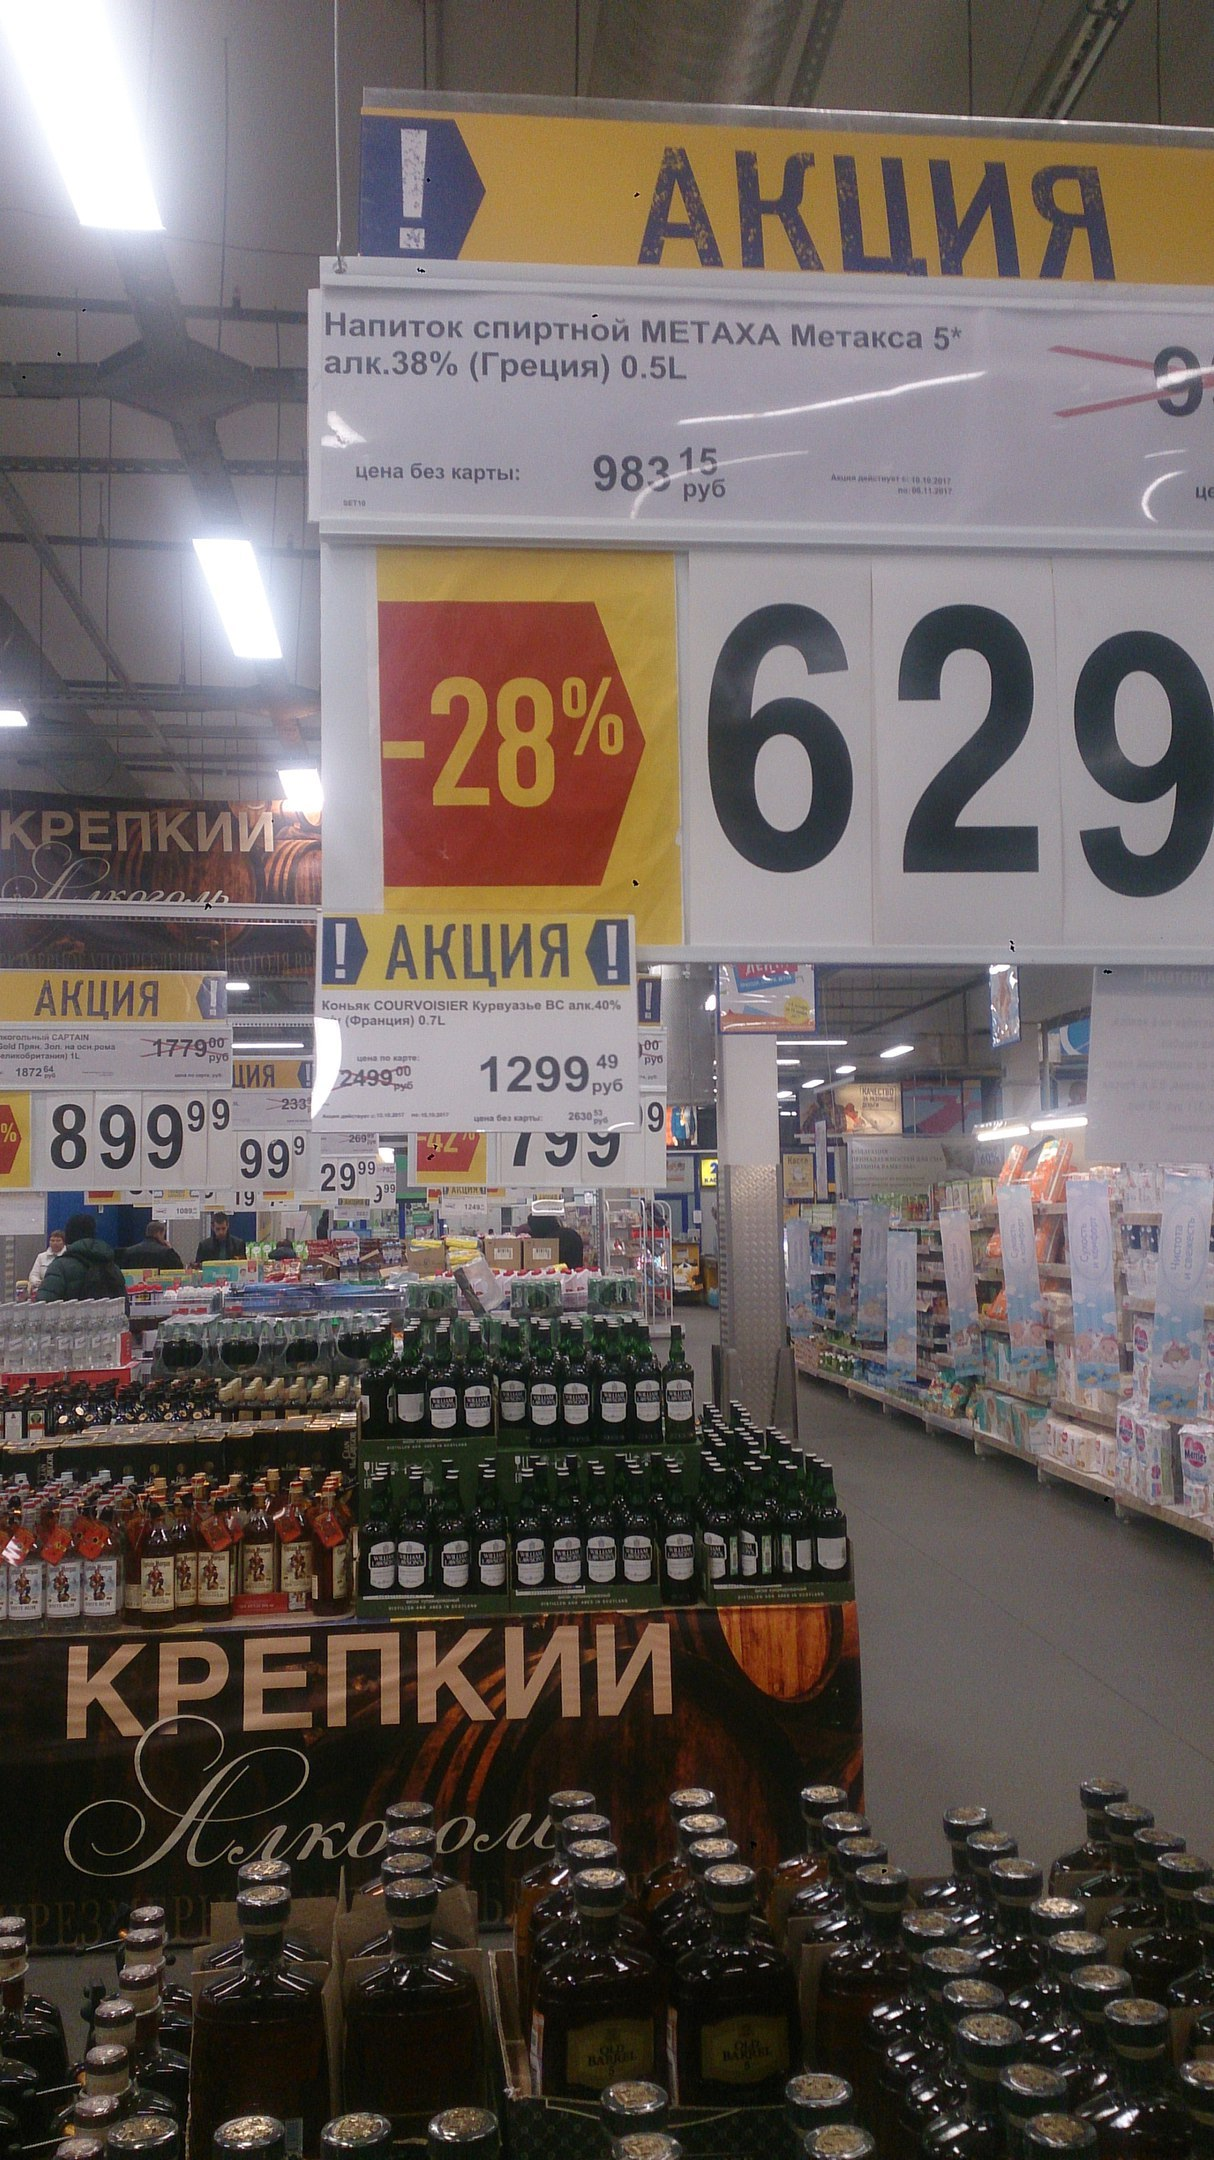 Гипермаркет Лента. Если цена на кассе не совпадает с ценником. Мануал.